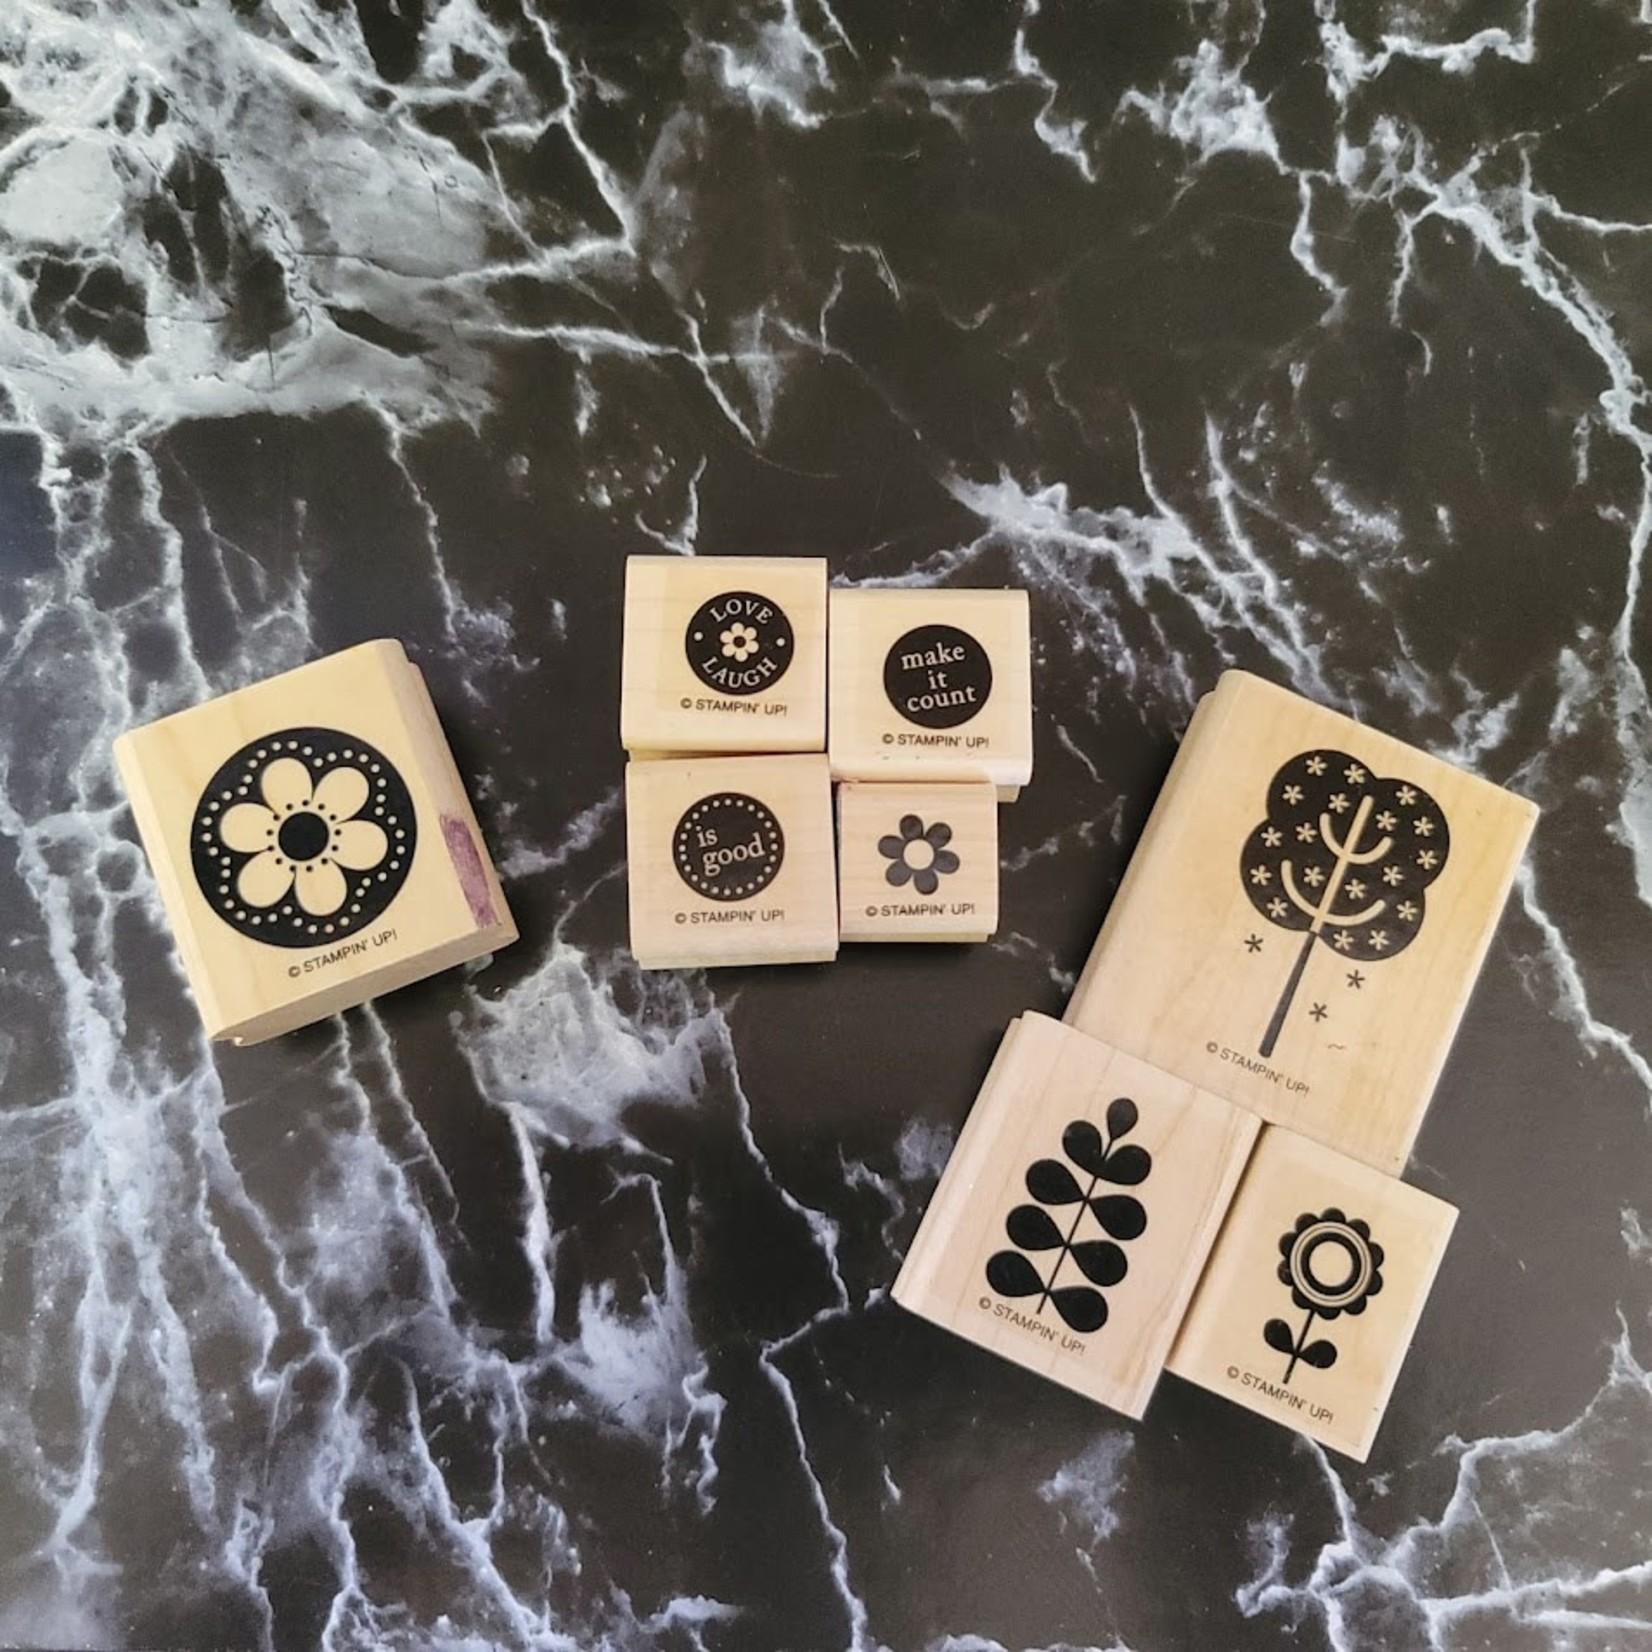 Stampin' Up - Wooden Stamp Set - make it count